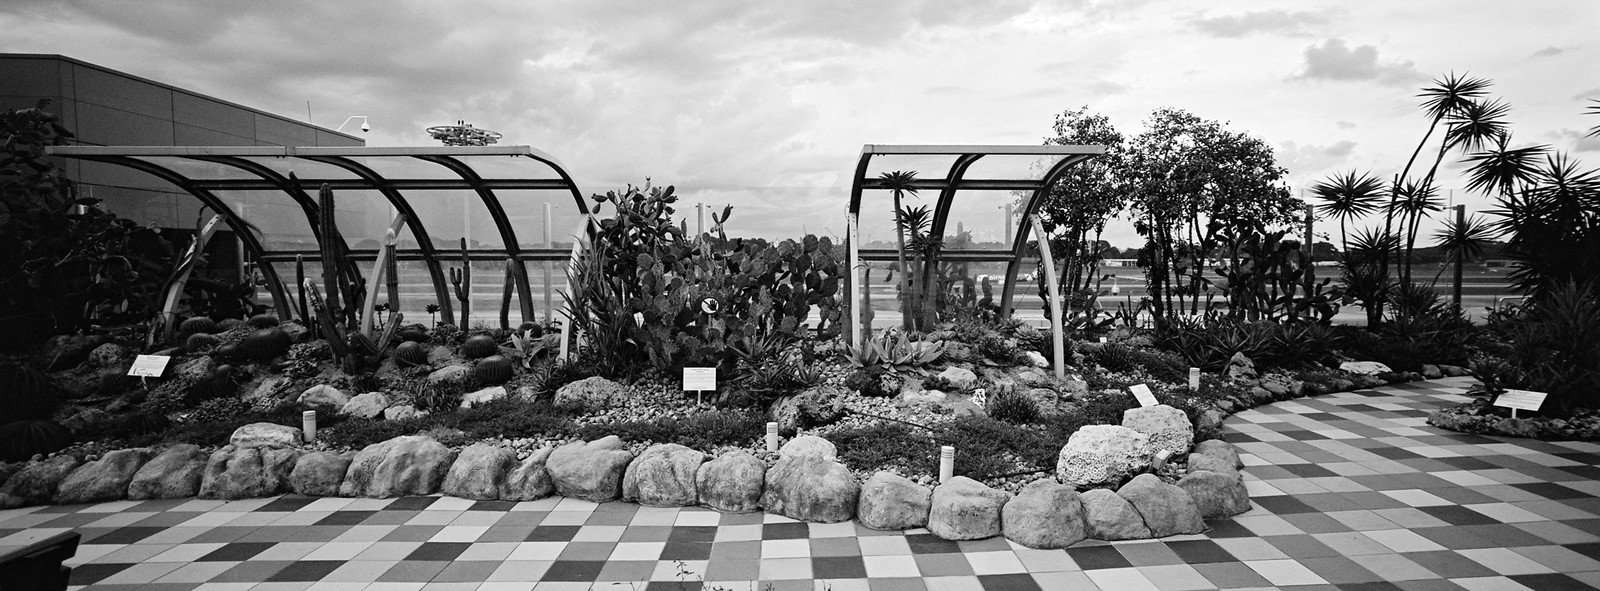 Changi Airport Cactus Garden ii